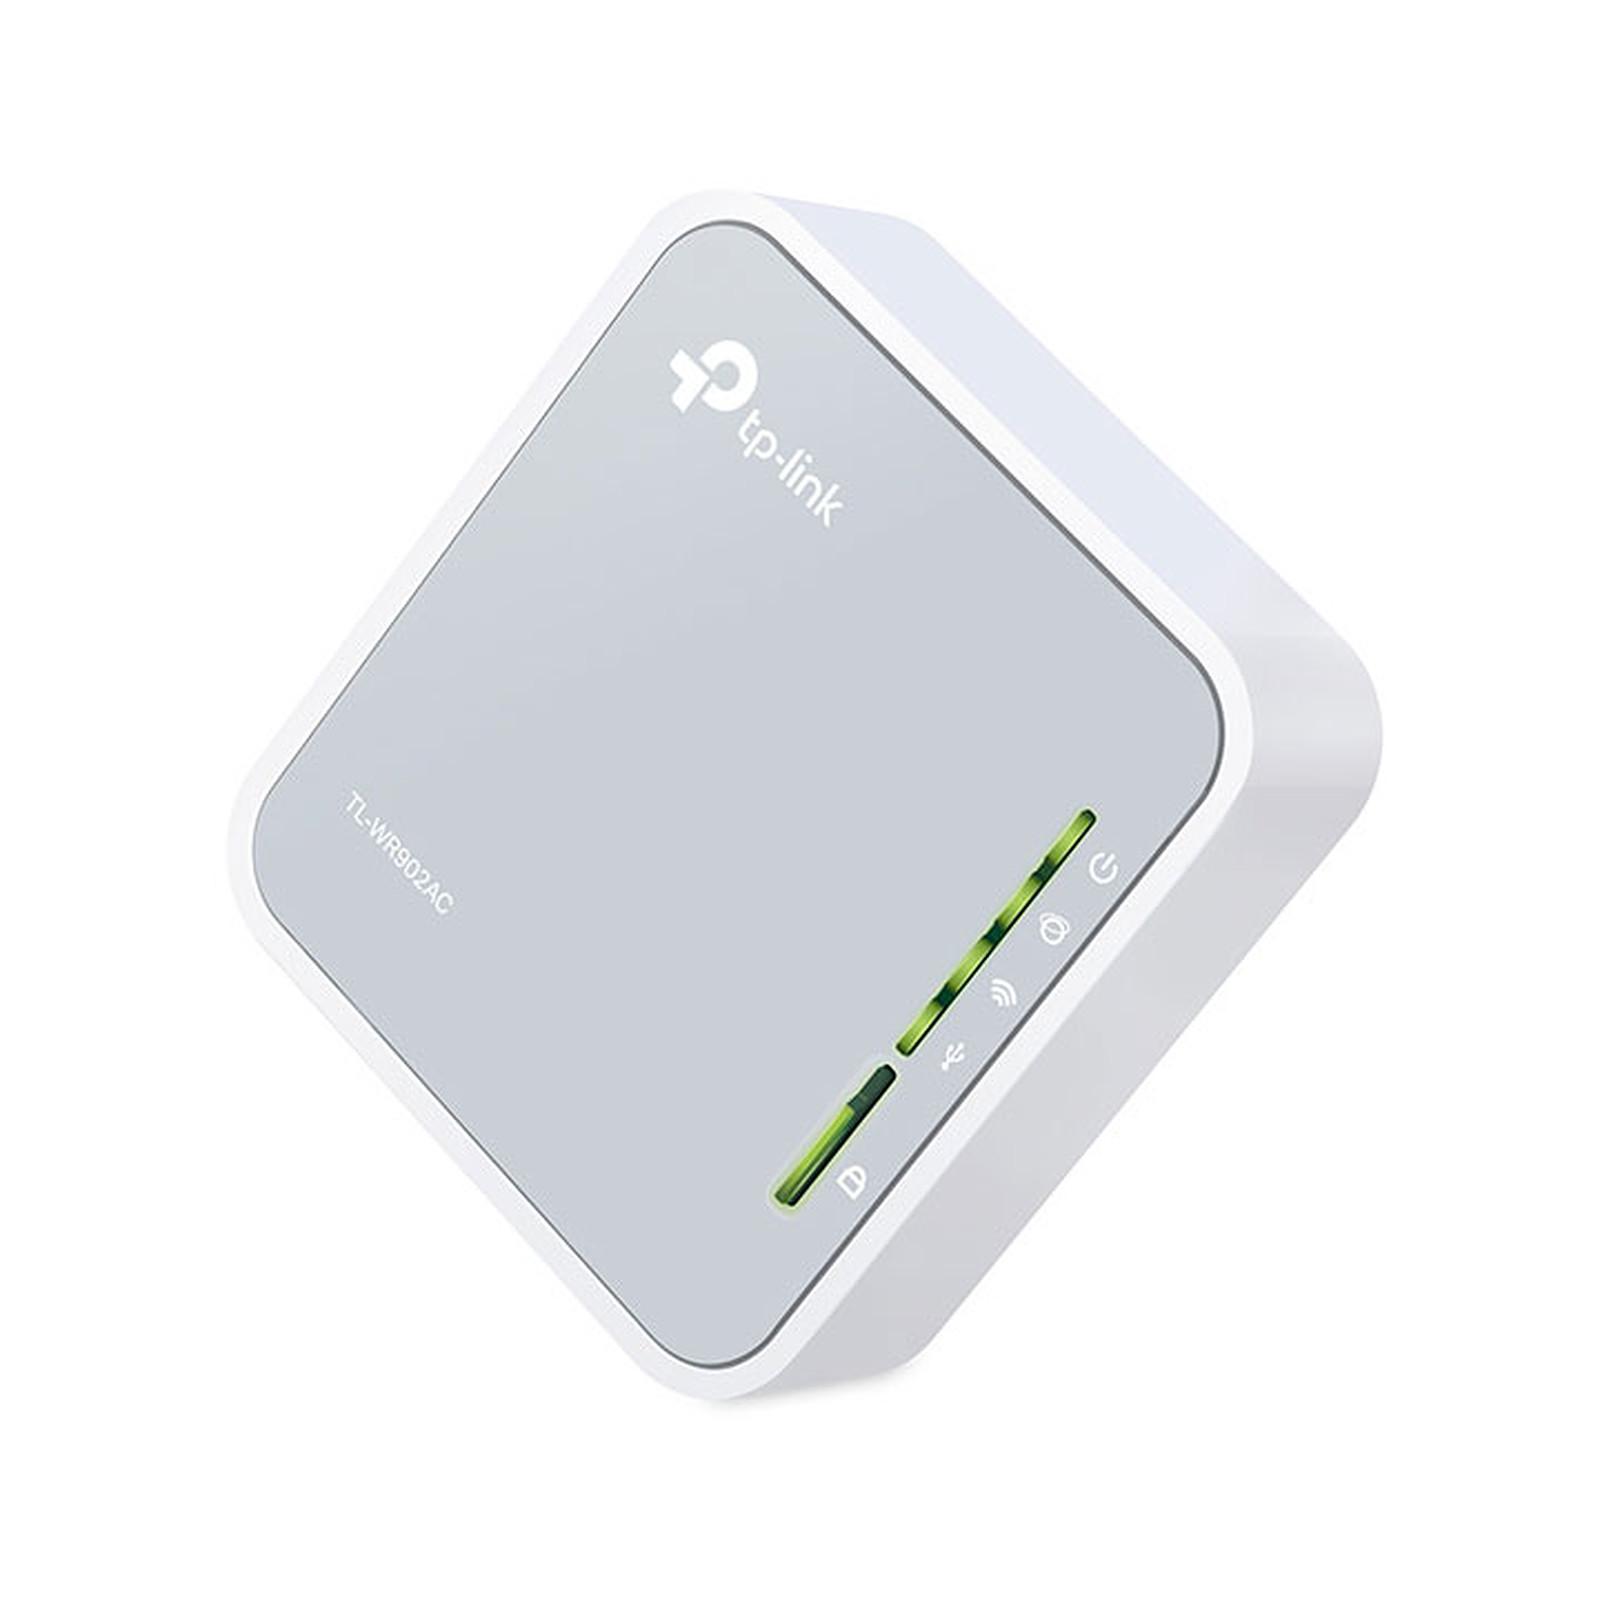 TP-Link TL-WR902AC AC750 Wi-Fi